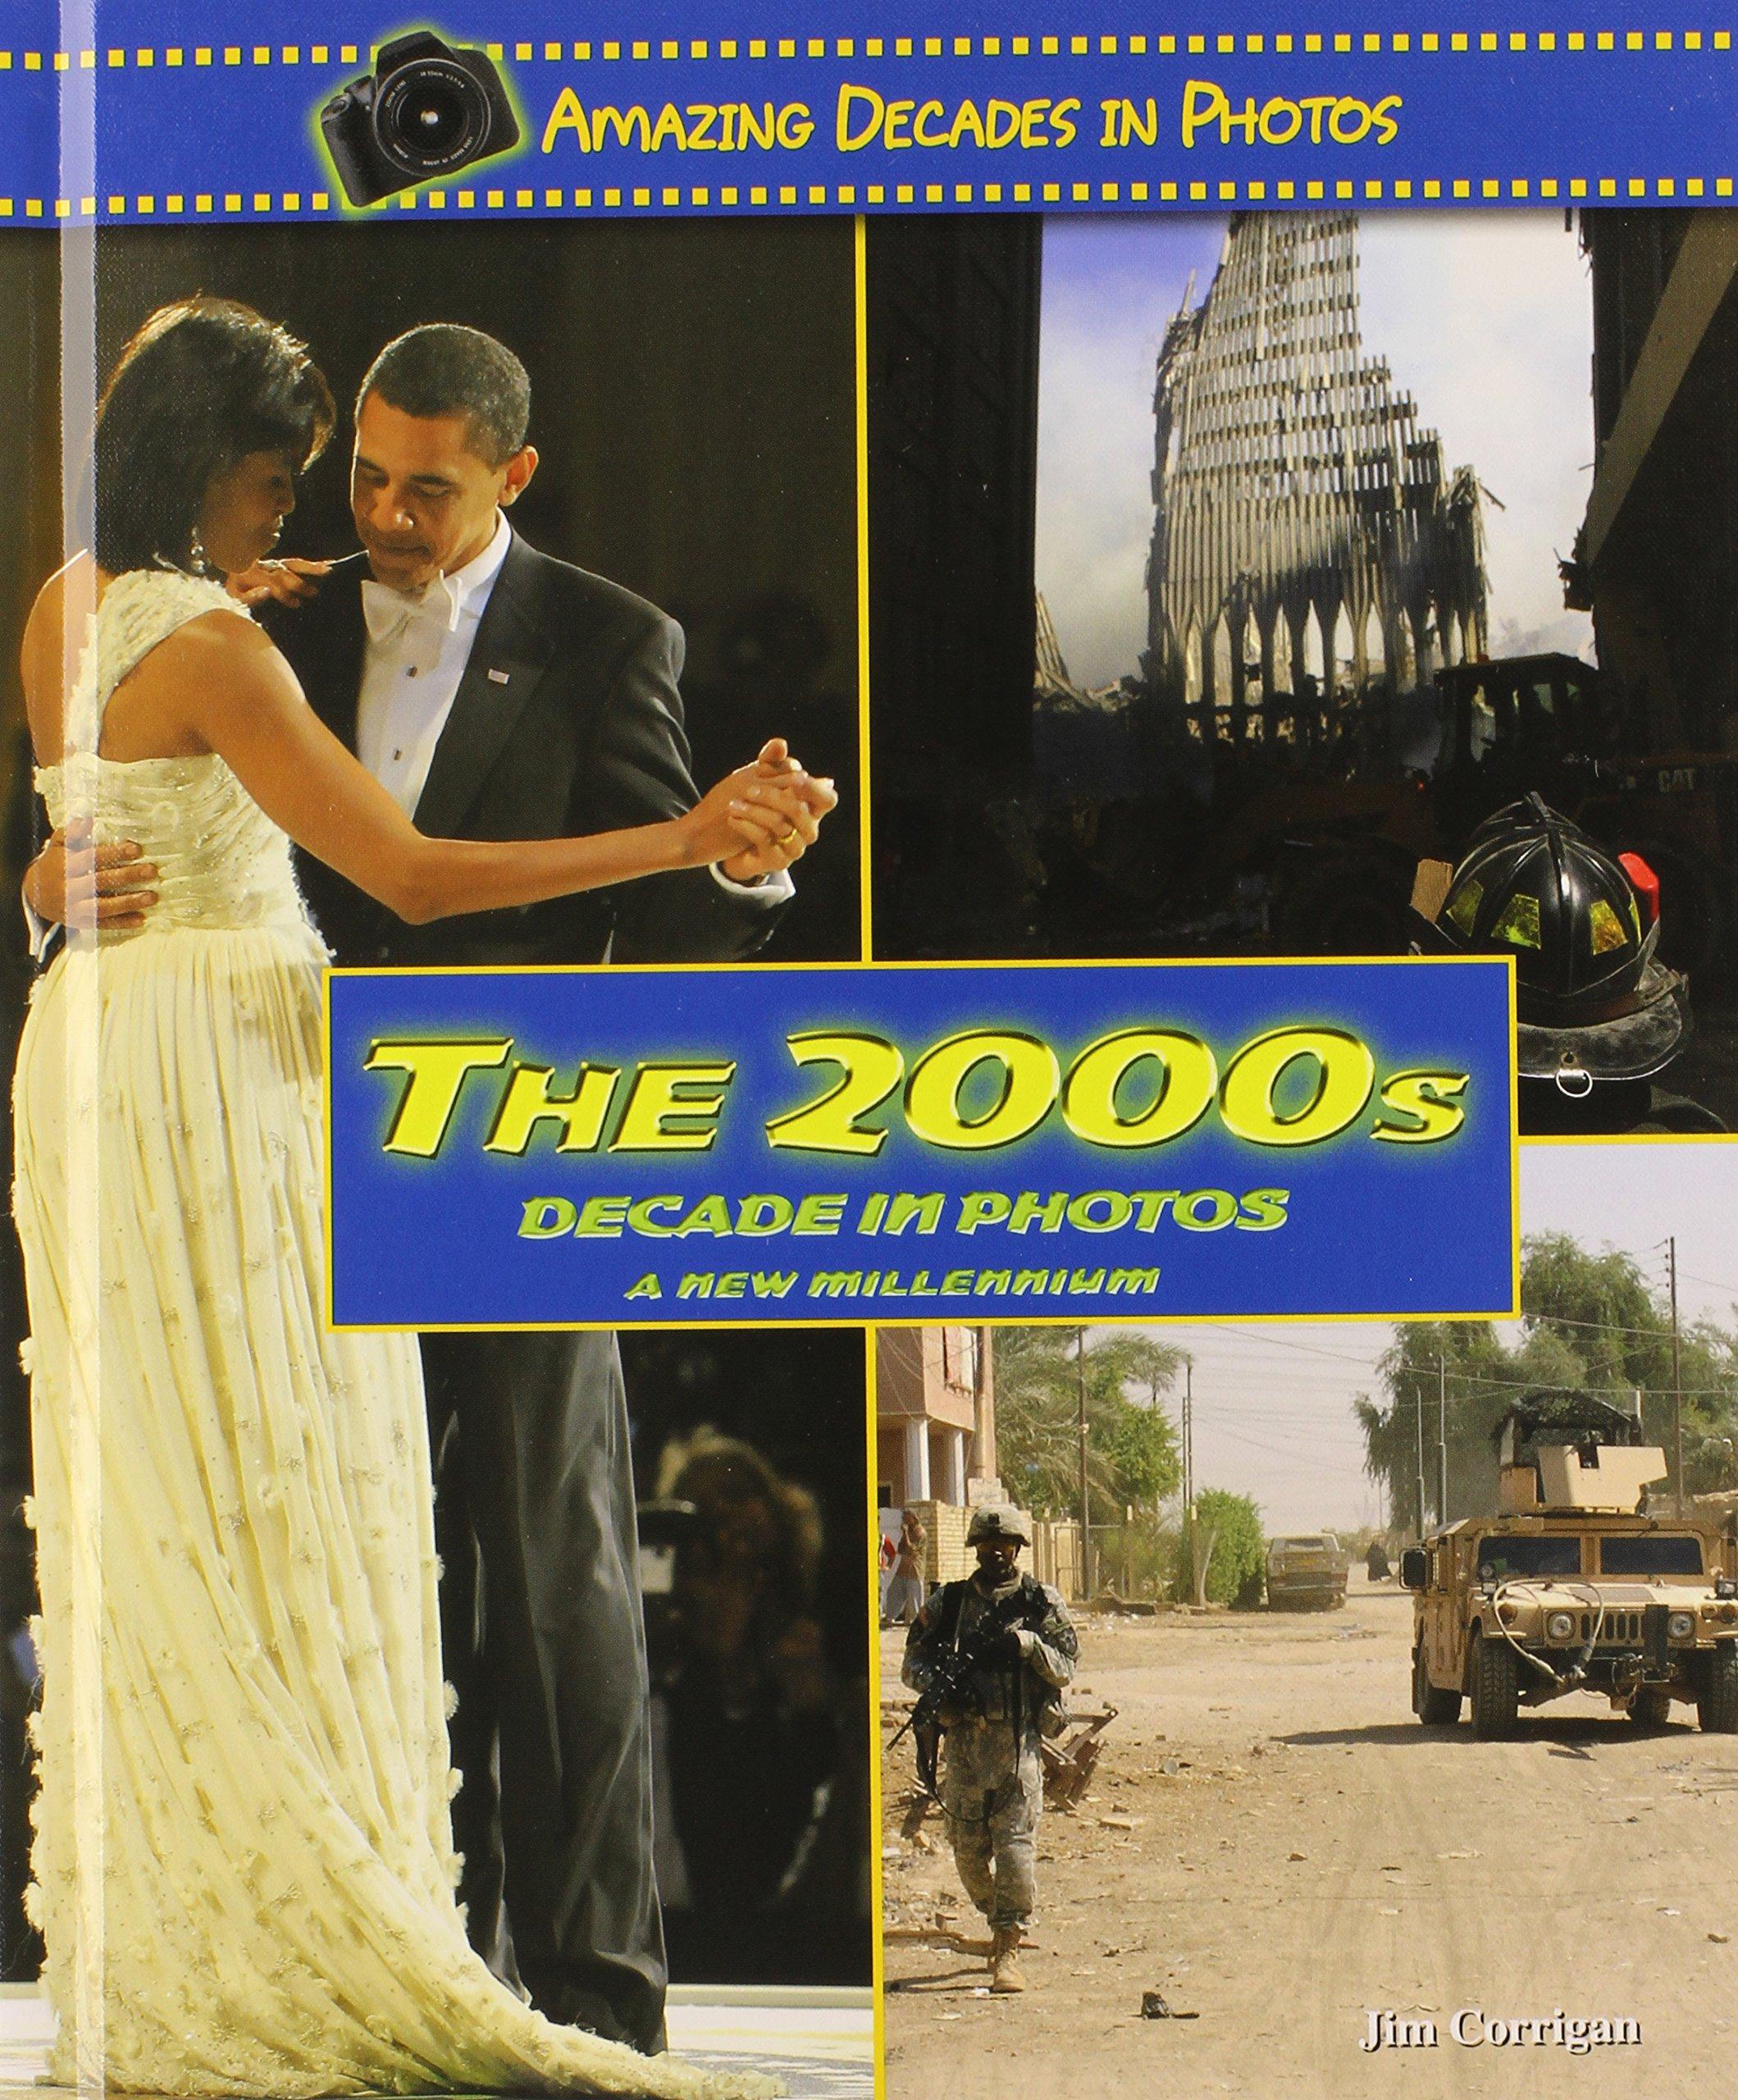 The 2000s Decade in Photos: A New Millennium (Amazing Decades in Photos)